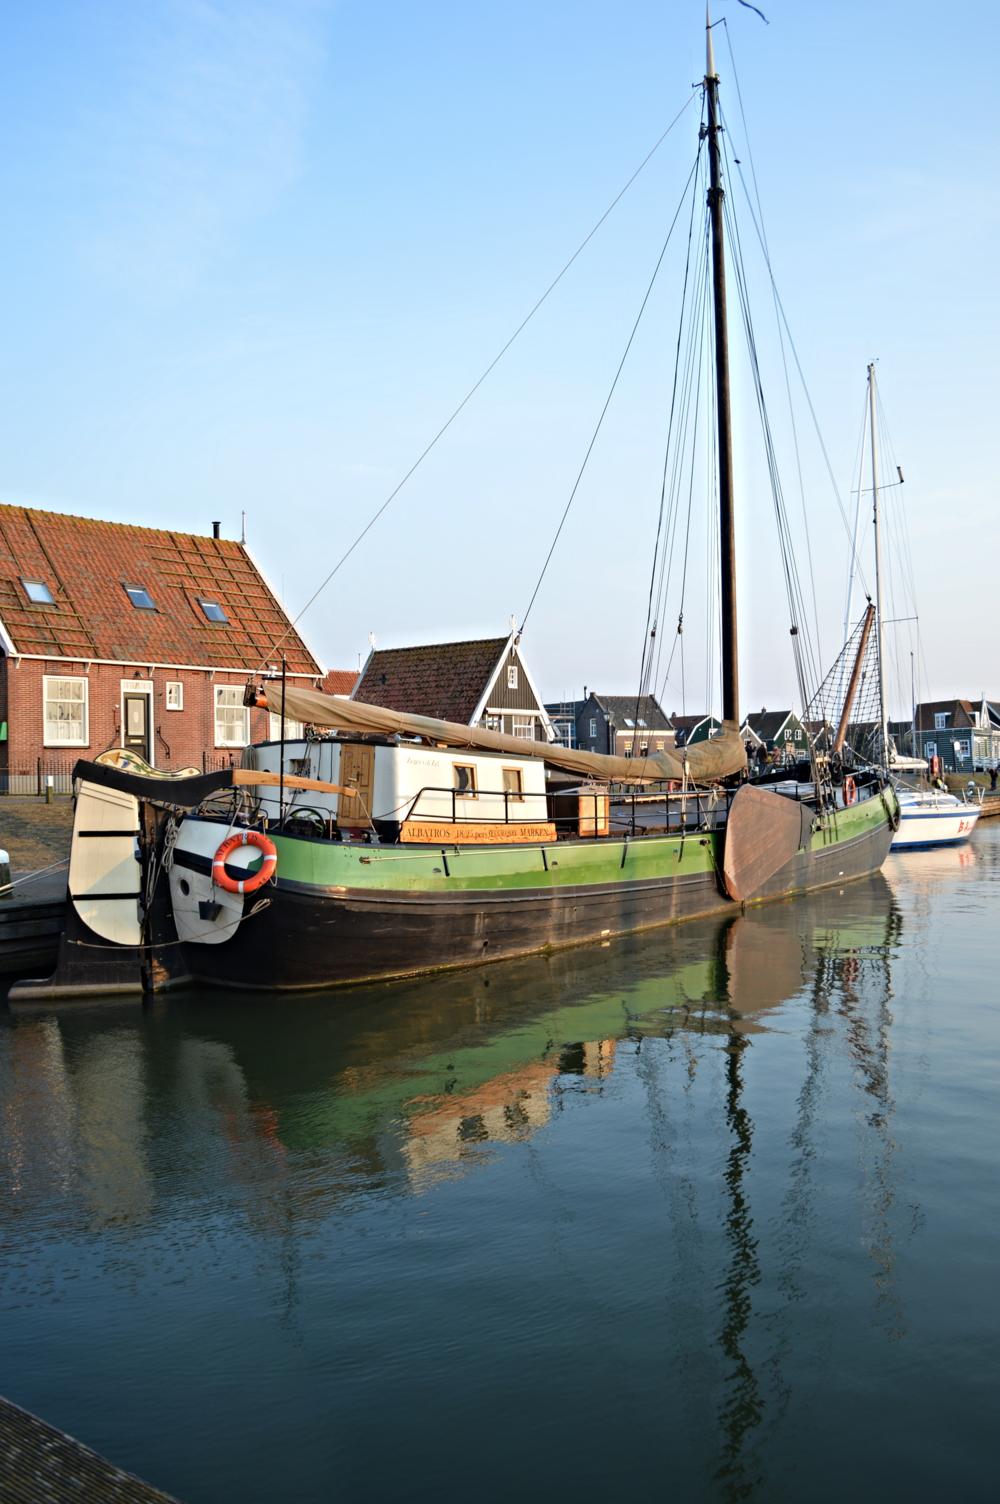 Boat - Marken, The Netherlands